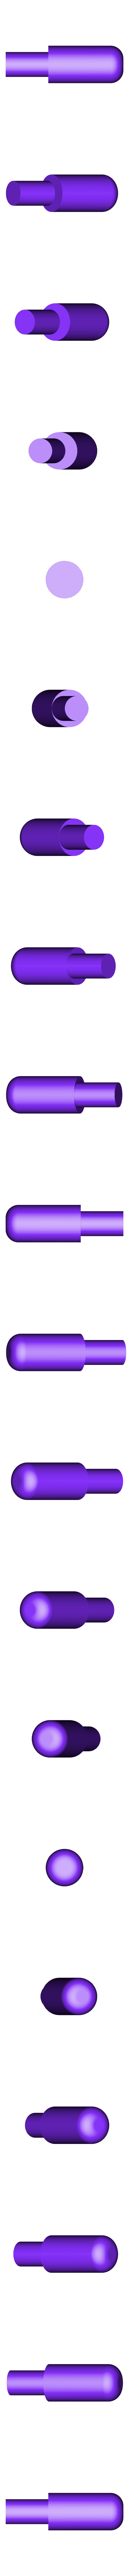 axe_poussoir.stl Download free STL file Folding Astroller knife with locking catch • 3D printer design, NOP21